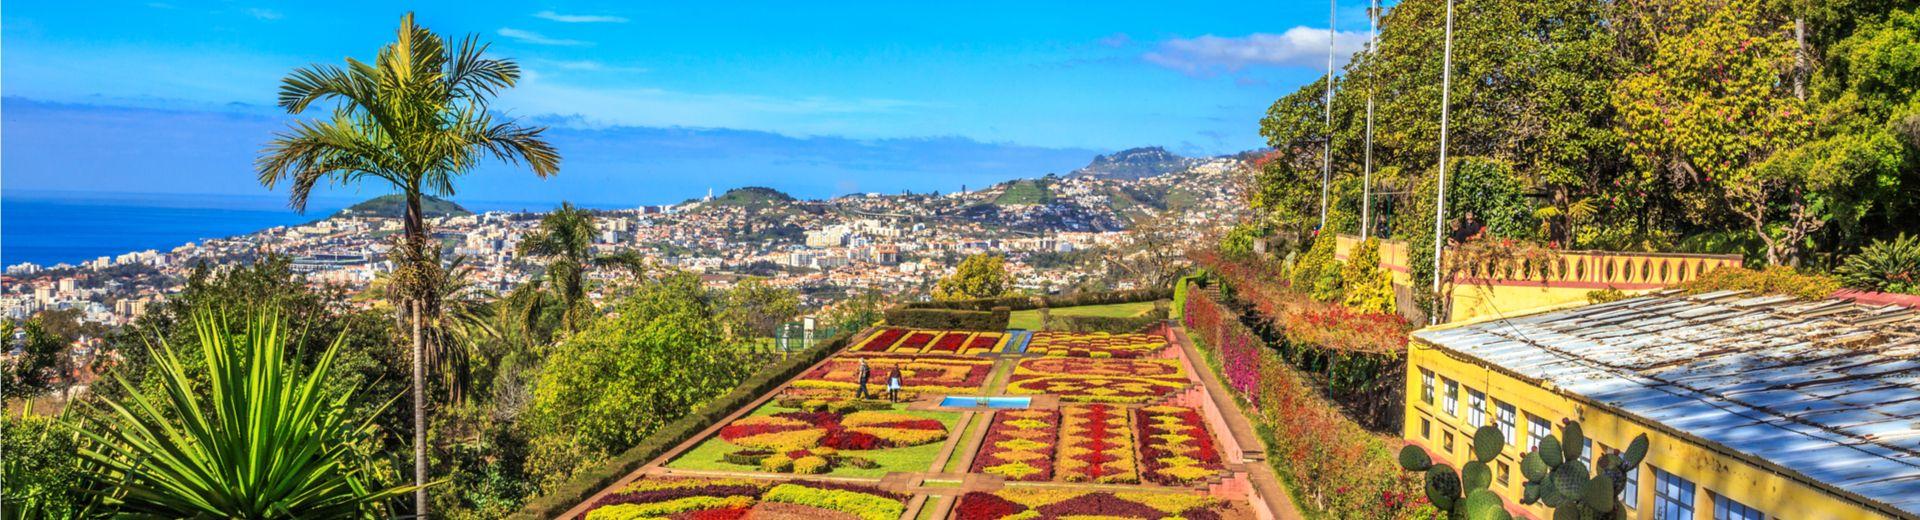 5-Sterne Hotel in Funchal